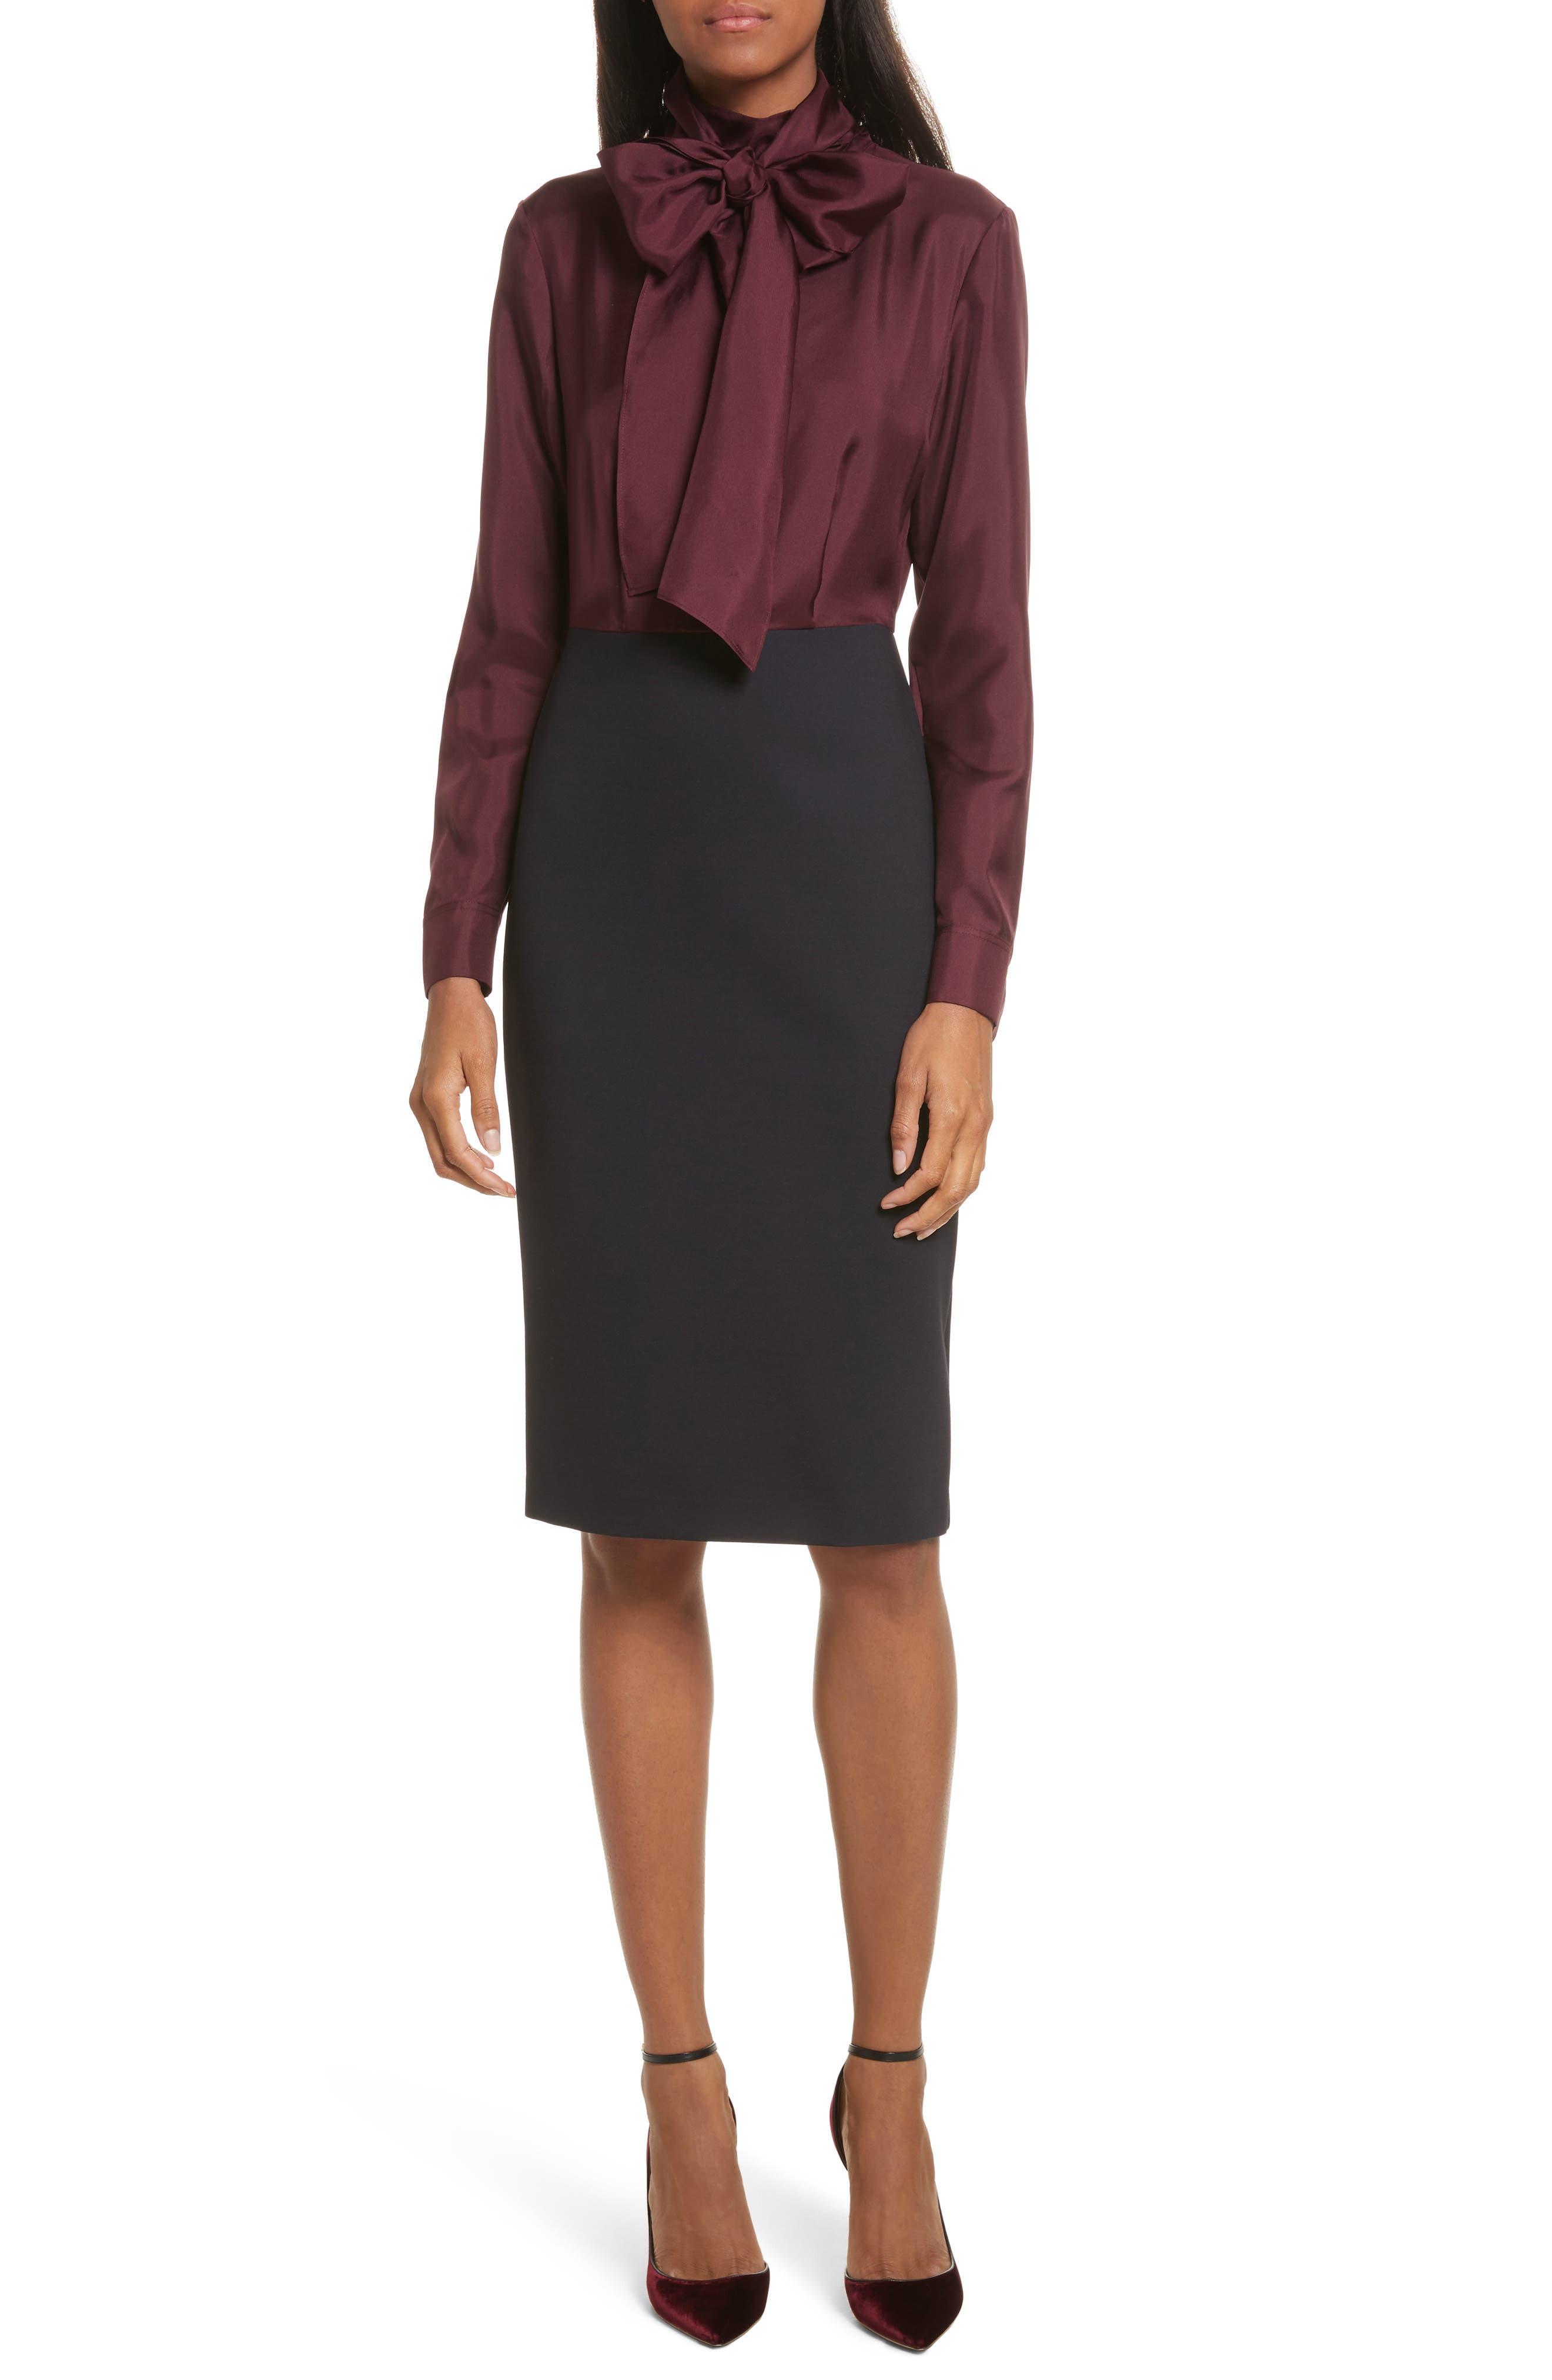 Jensah Tie Neck Mixed Media Dress,                         Main,                         color, Dark Blue